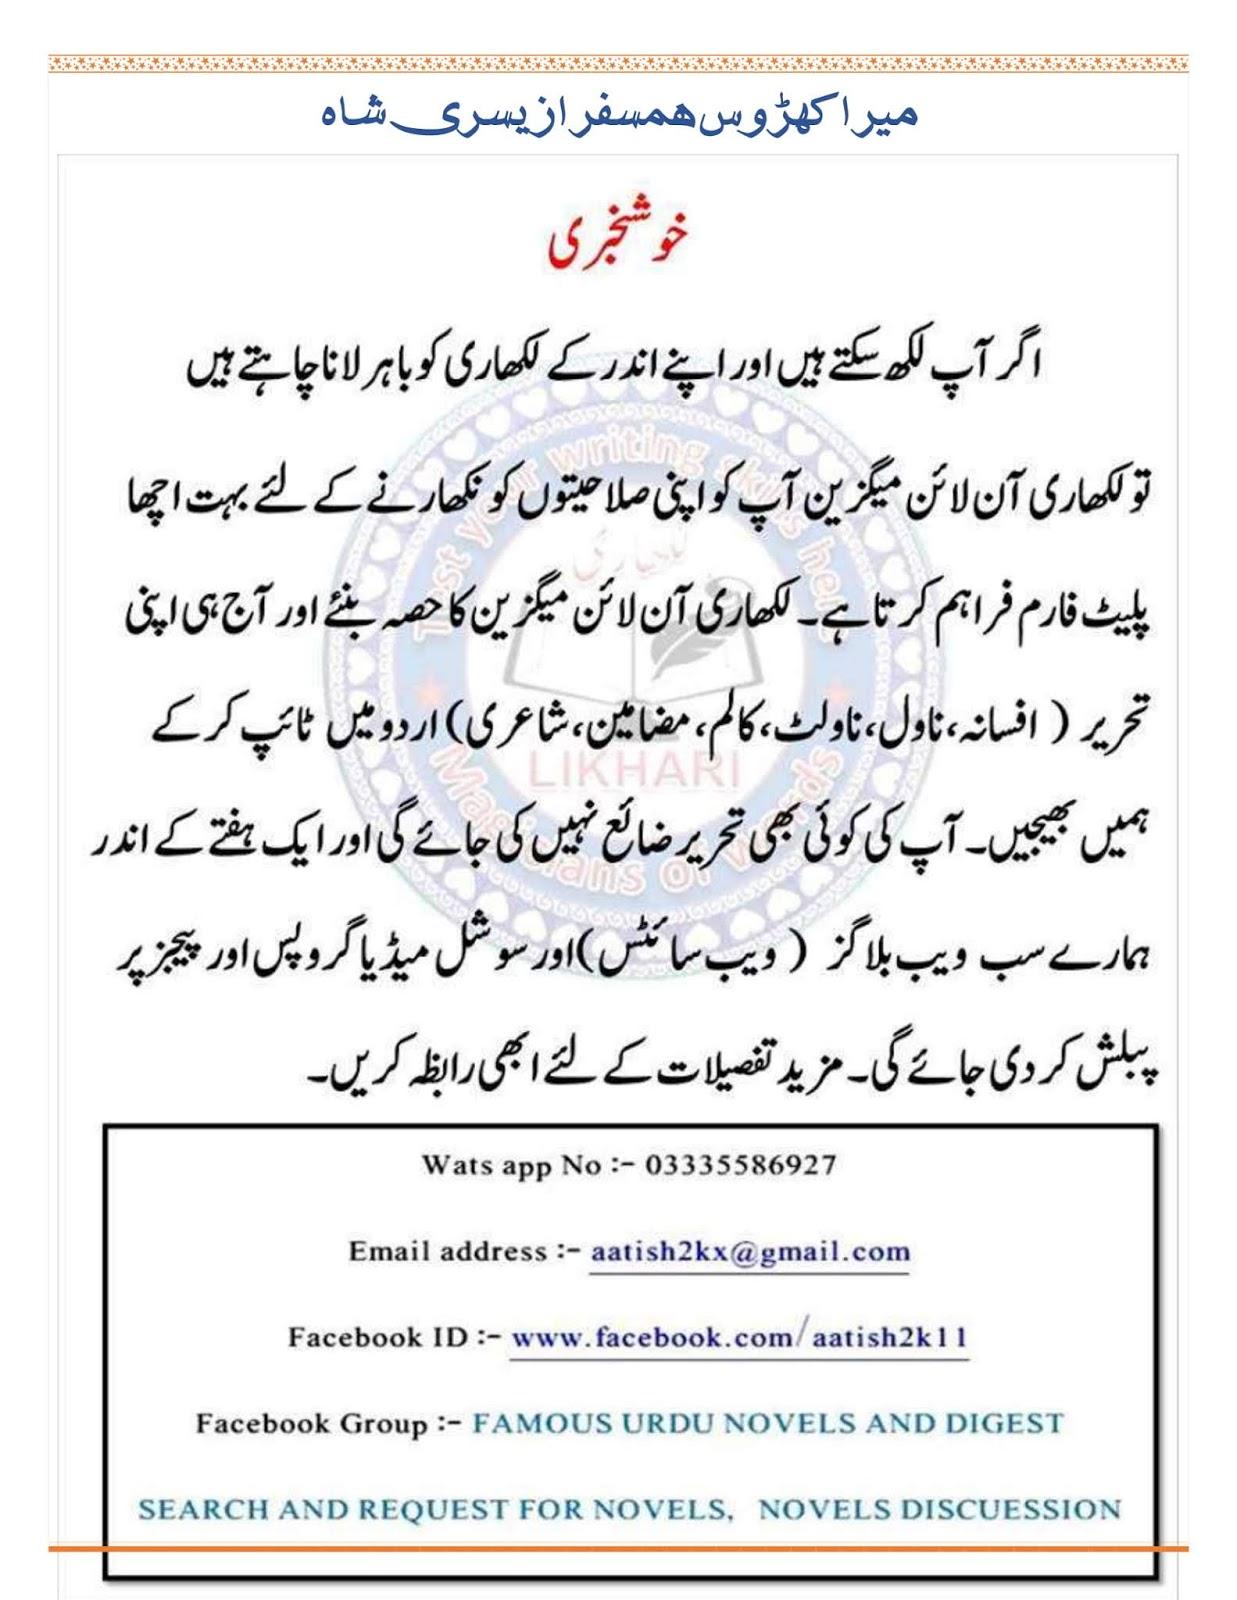 Mera Kharos Humsafar By Yousra Shah Complete Romantic Novel   Page 9